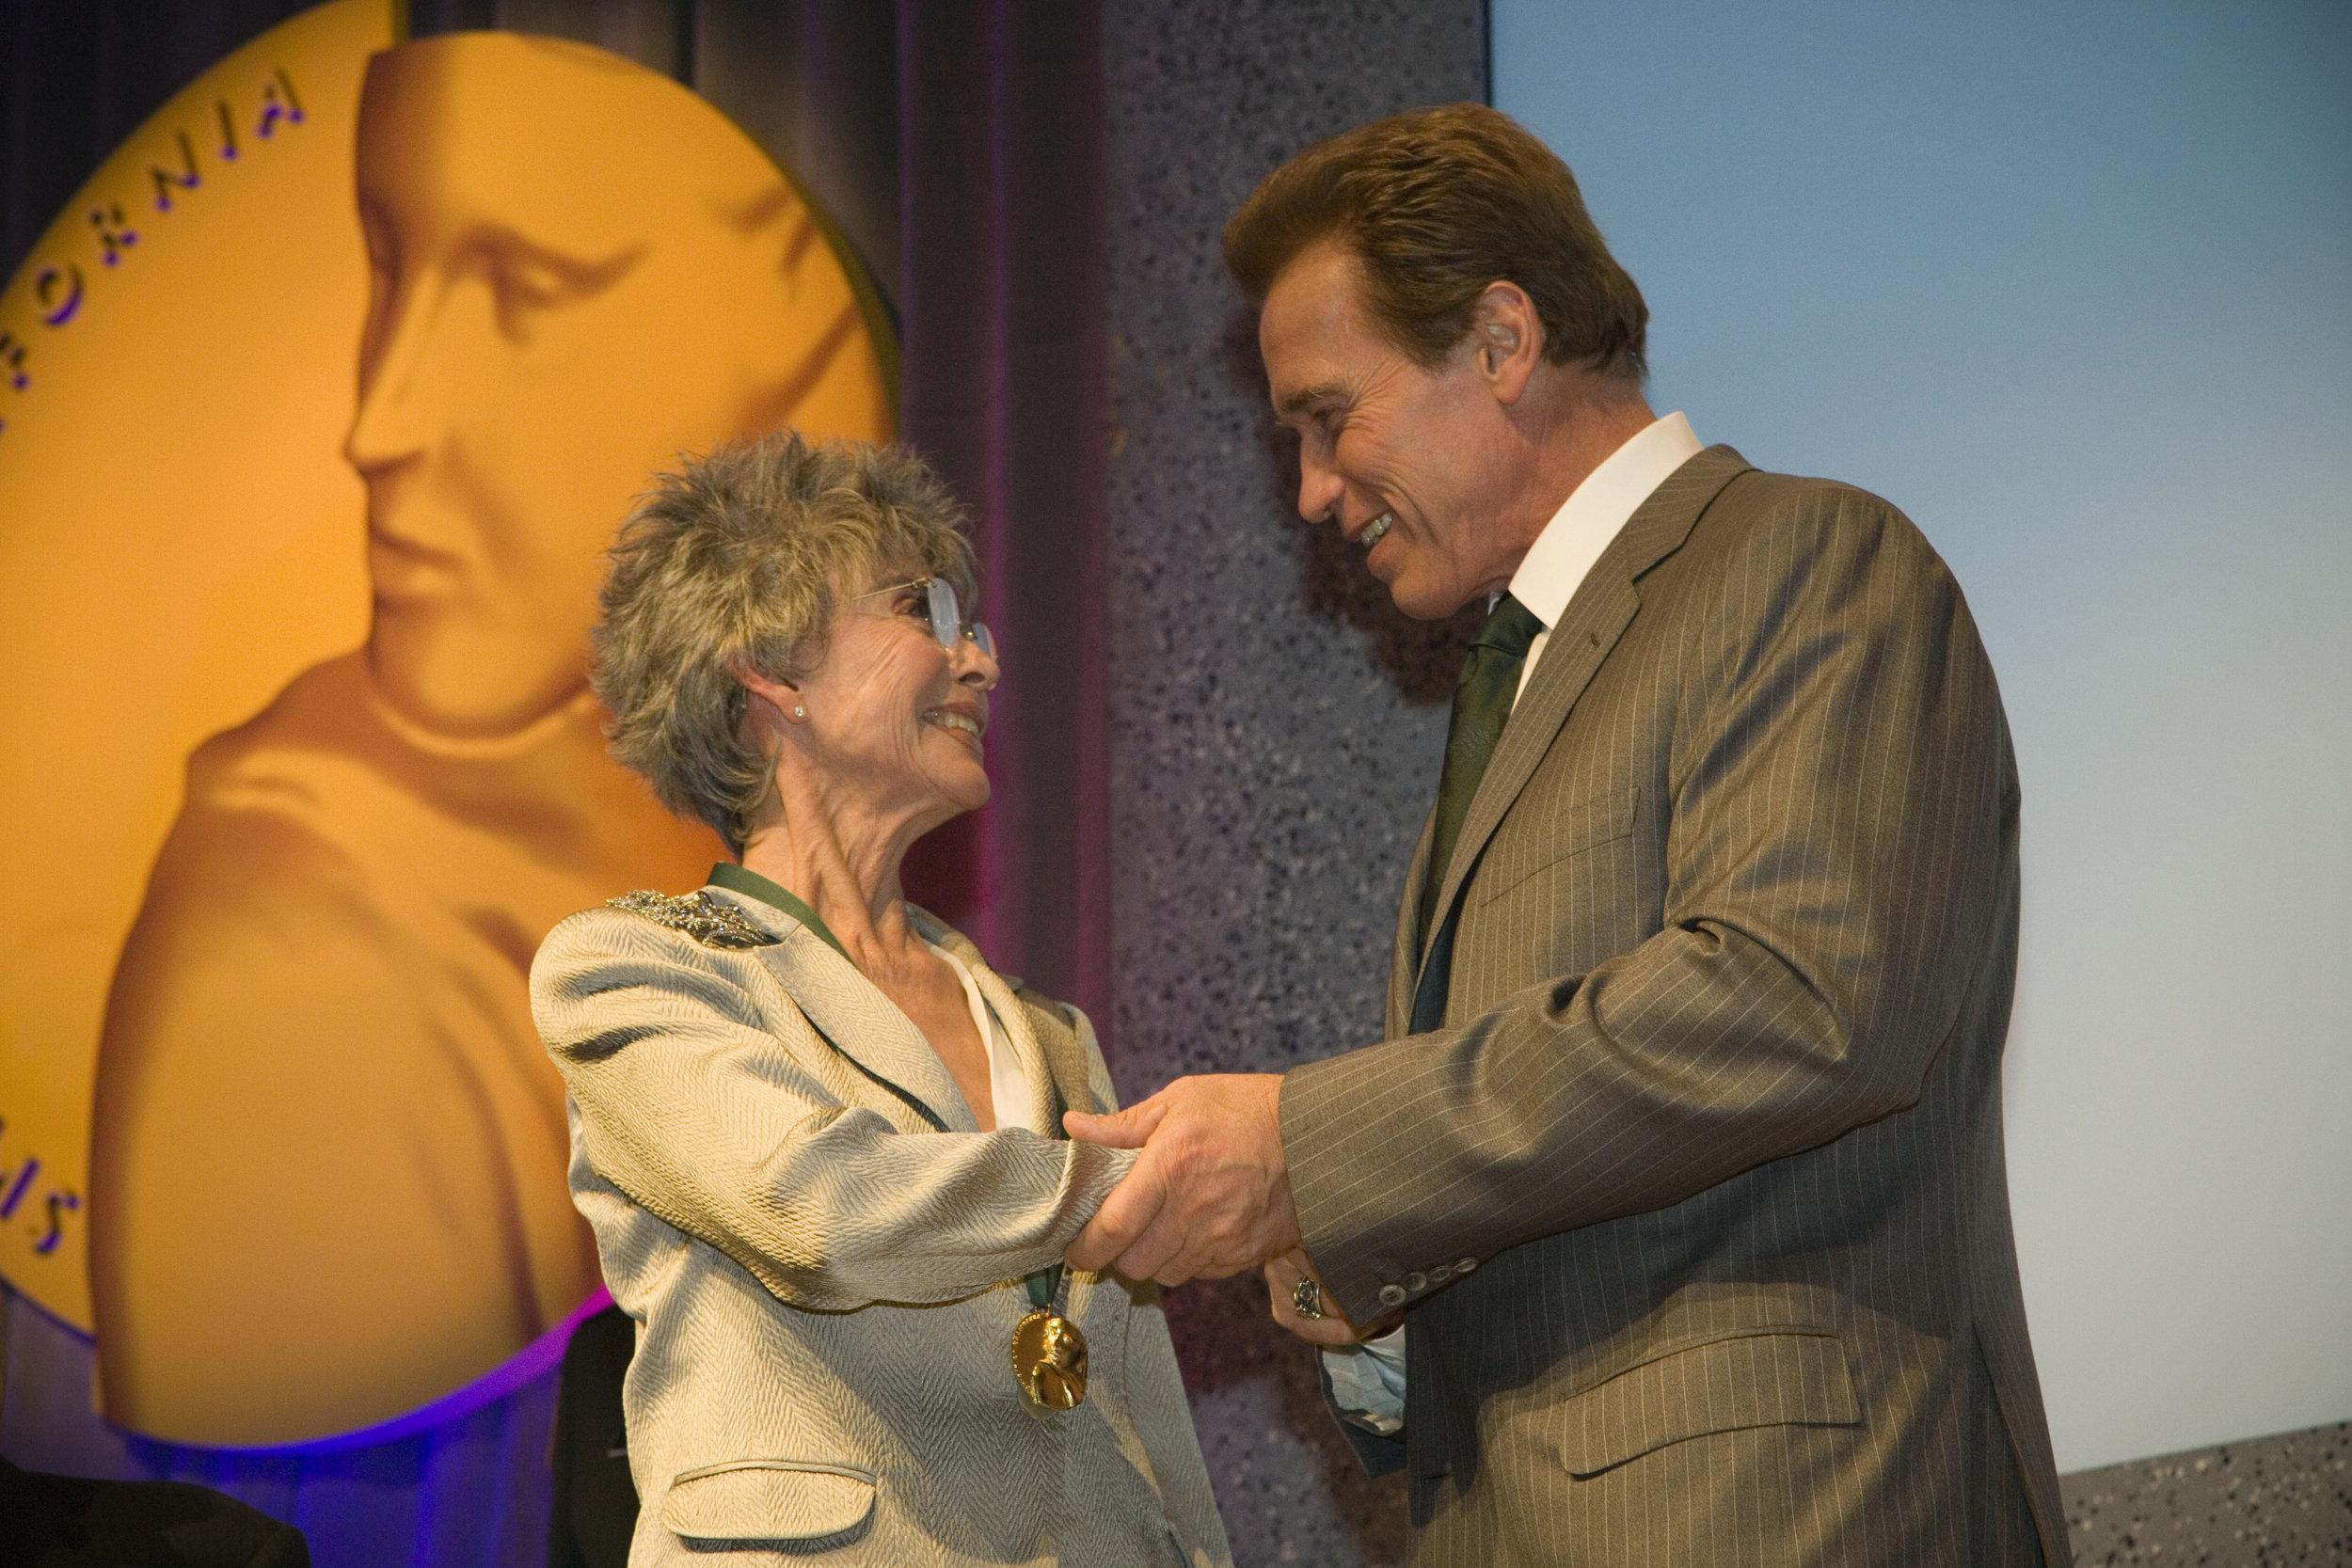 Governor Arnold Schwarzenegger congratulates Rita Moreno upon her induction into the California Museum Hall of fame.